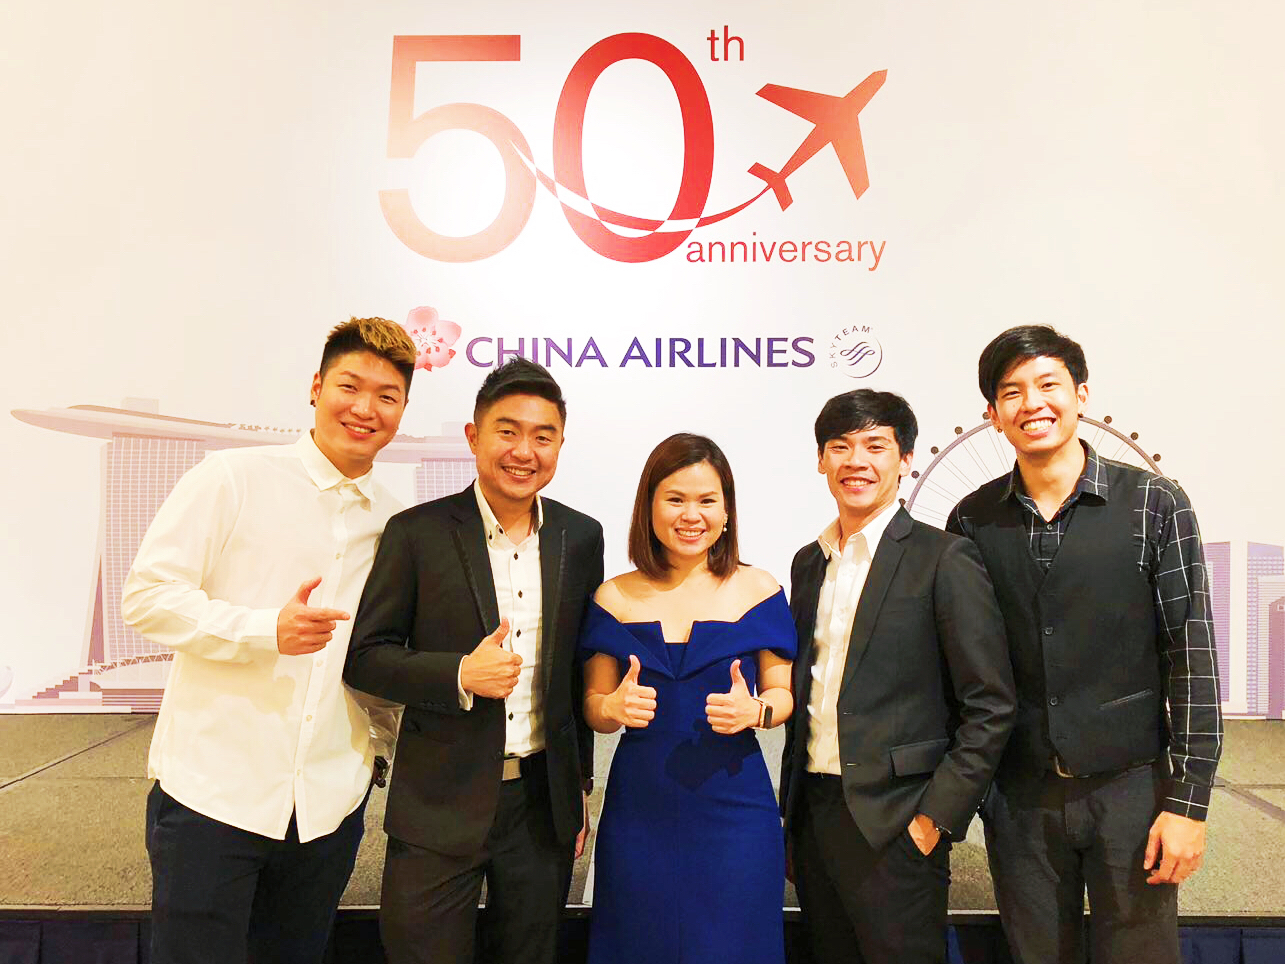 China Airlines' 50th Anniversary